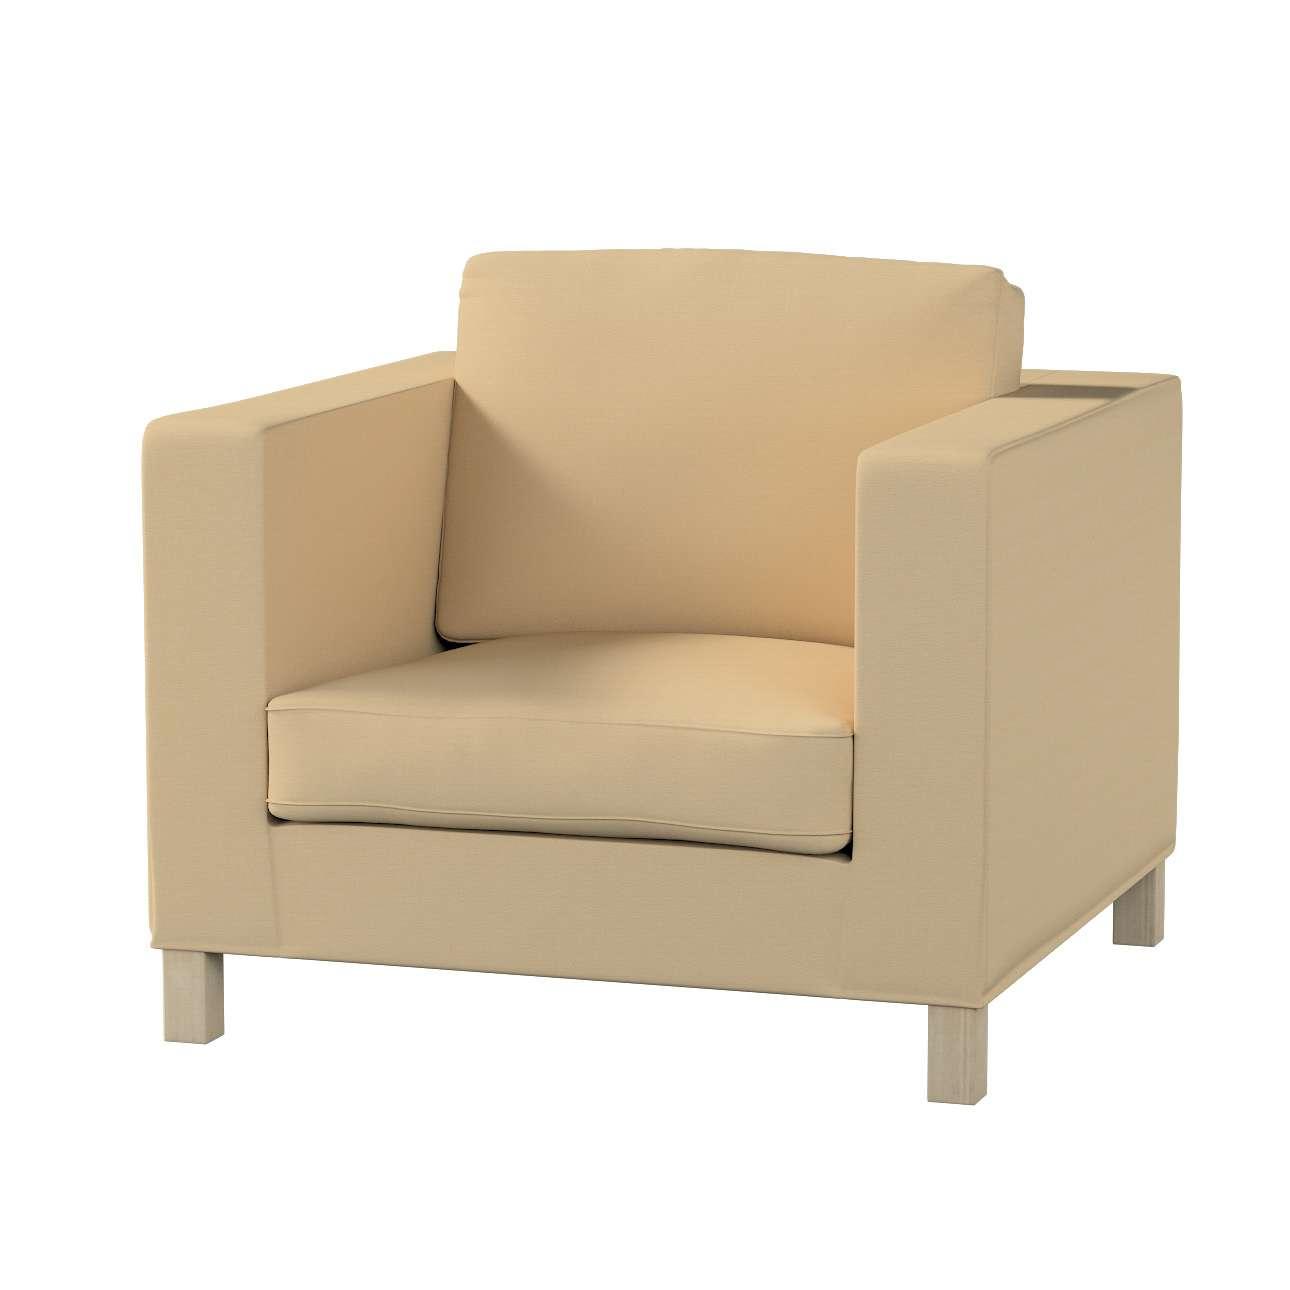 Karlanda fotelhuzat rövid a kollekcióból Cotton Panama Bútorszövet, Dekoranyag: 702-01